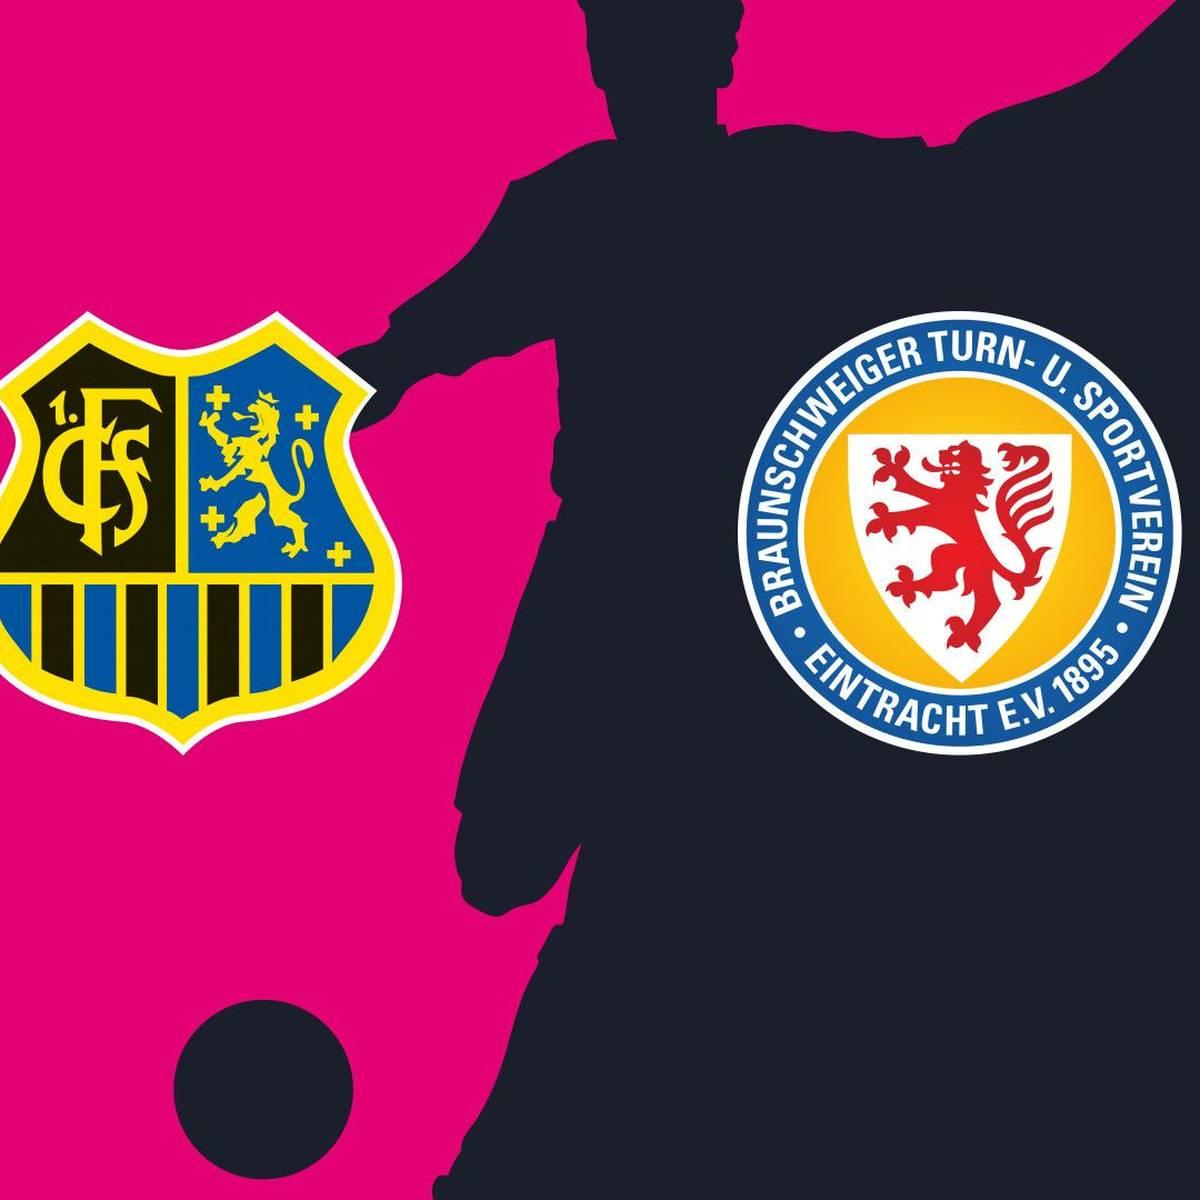 1. FC Saarbrücken - Eintracht Braunschweig (Highlights)